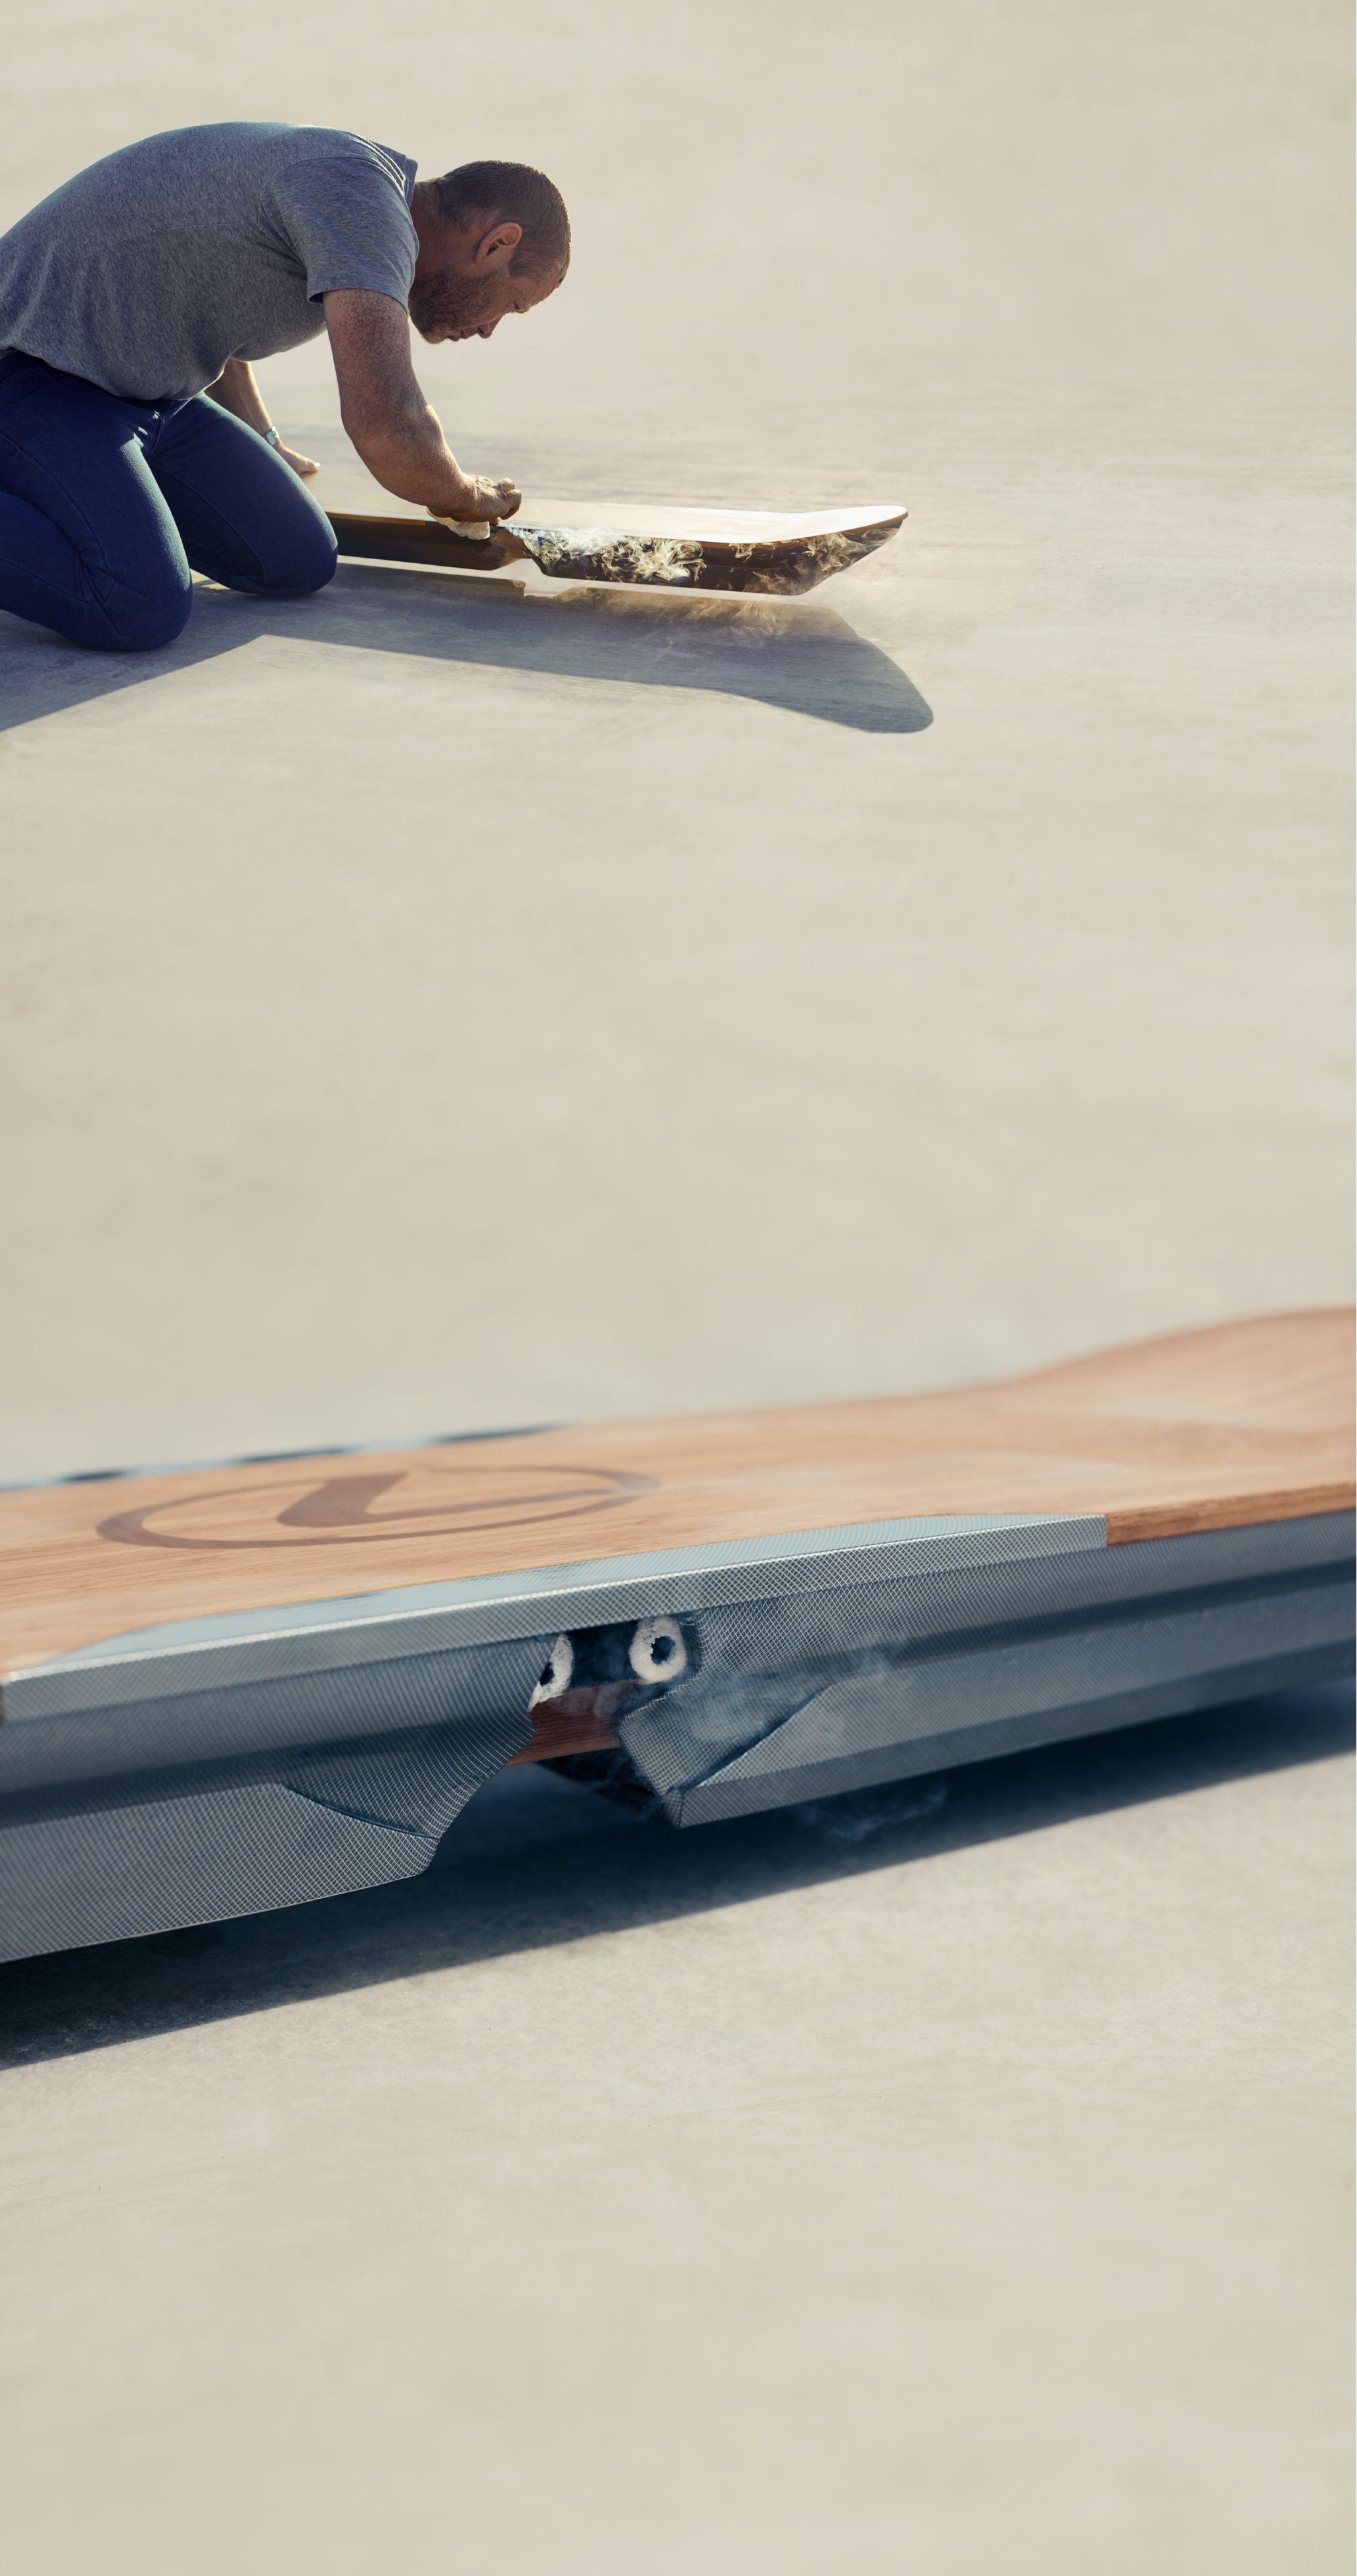 Lexus Hoverboard Price >> Lexus Experience Amazing Slide Skateboard Design Lexus